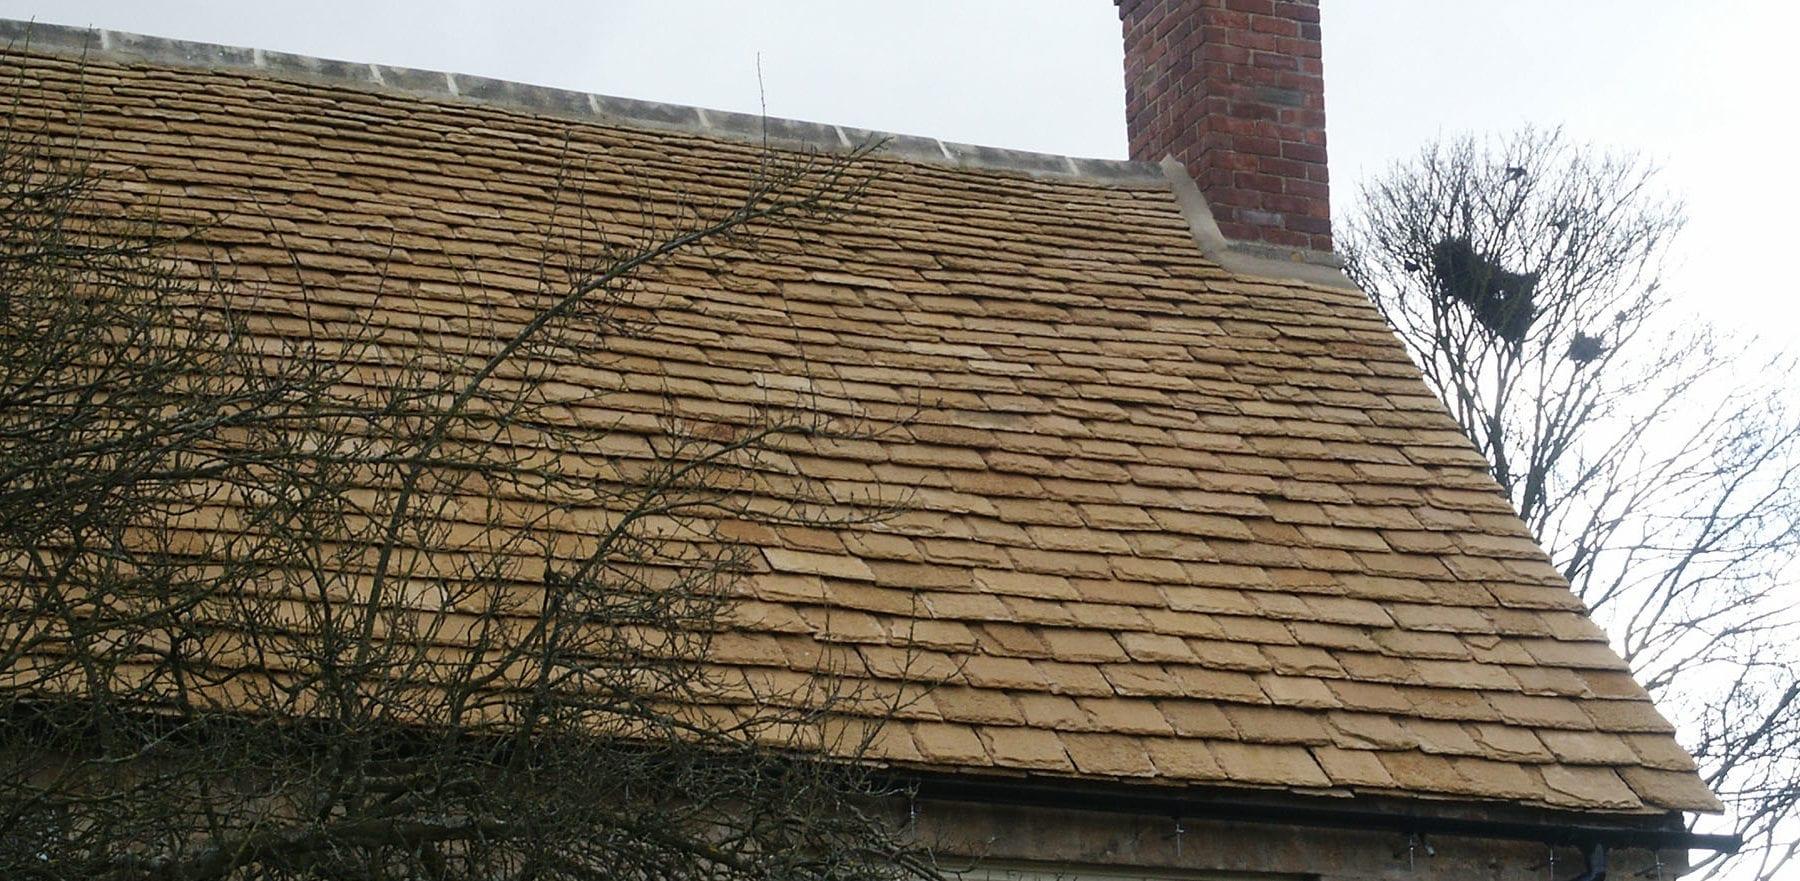 Lifestiles - Natural Stone Roof Tiles - On The Marsh, England 5